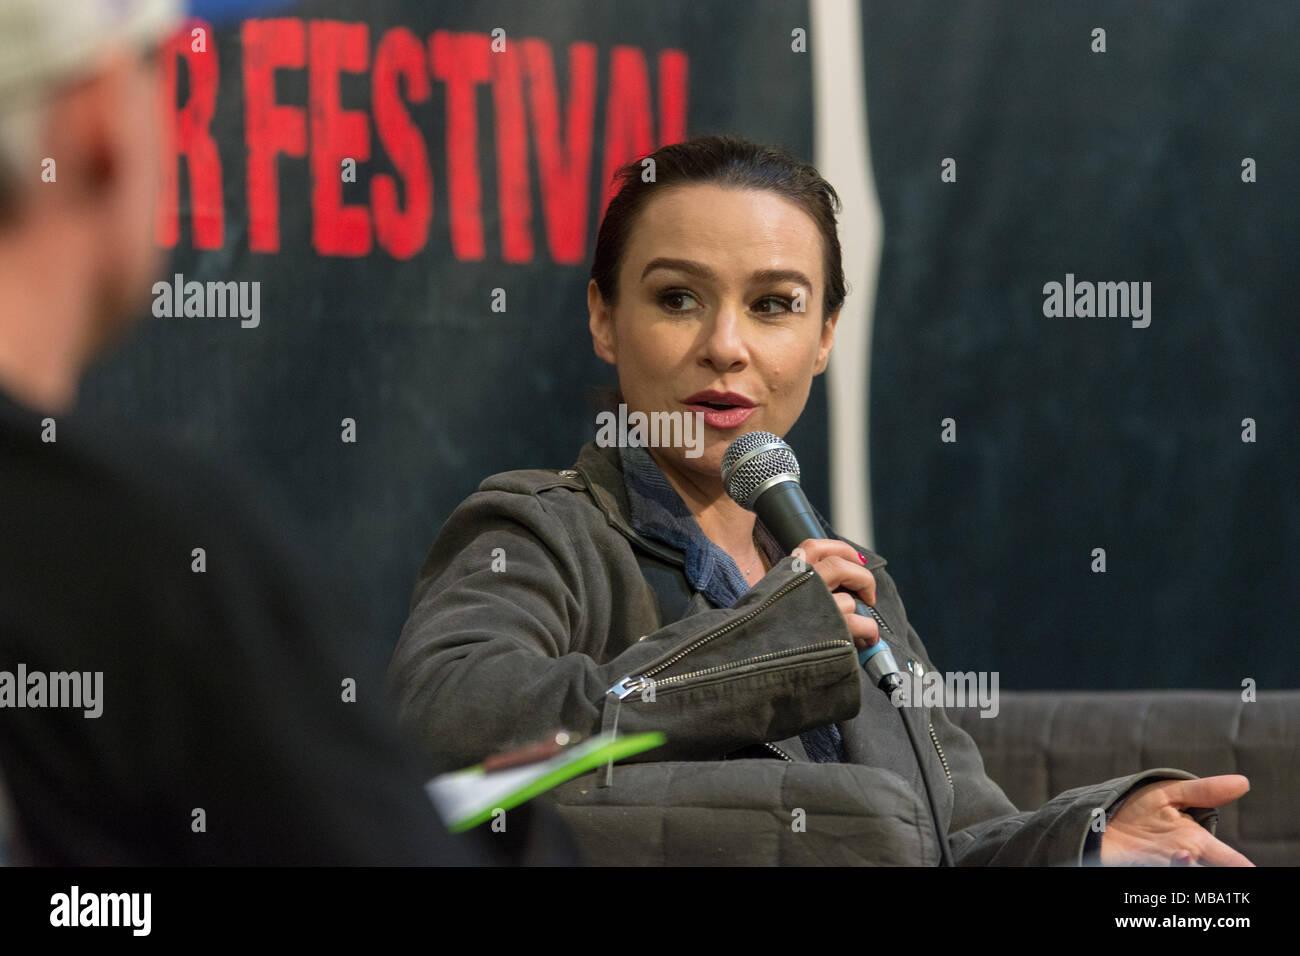 dortmund, germany - april 8: actress danielle harris (halloween